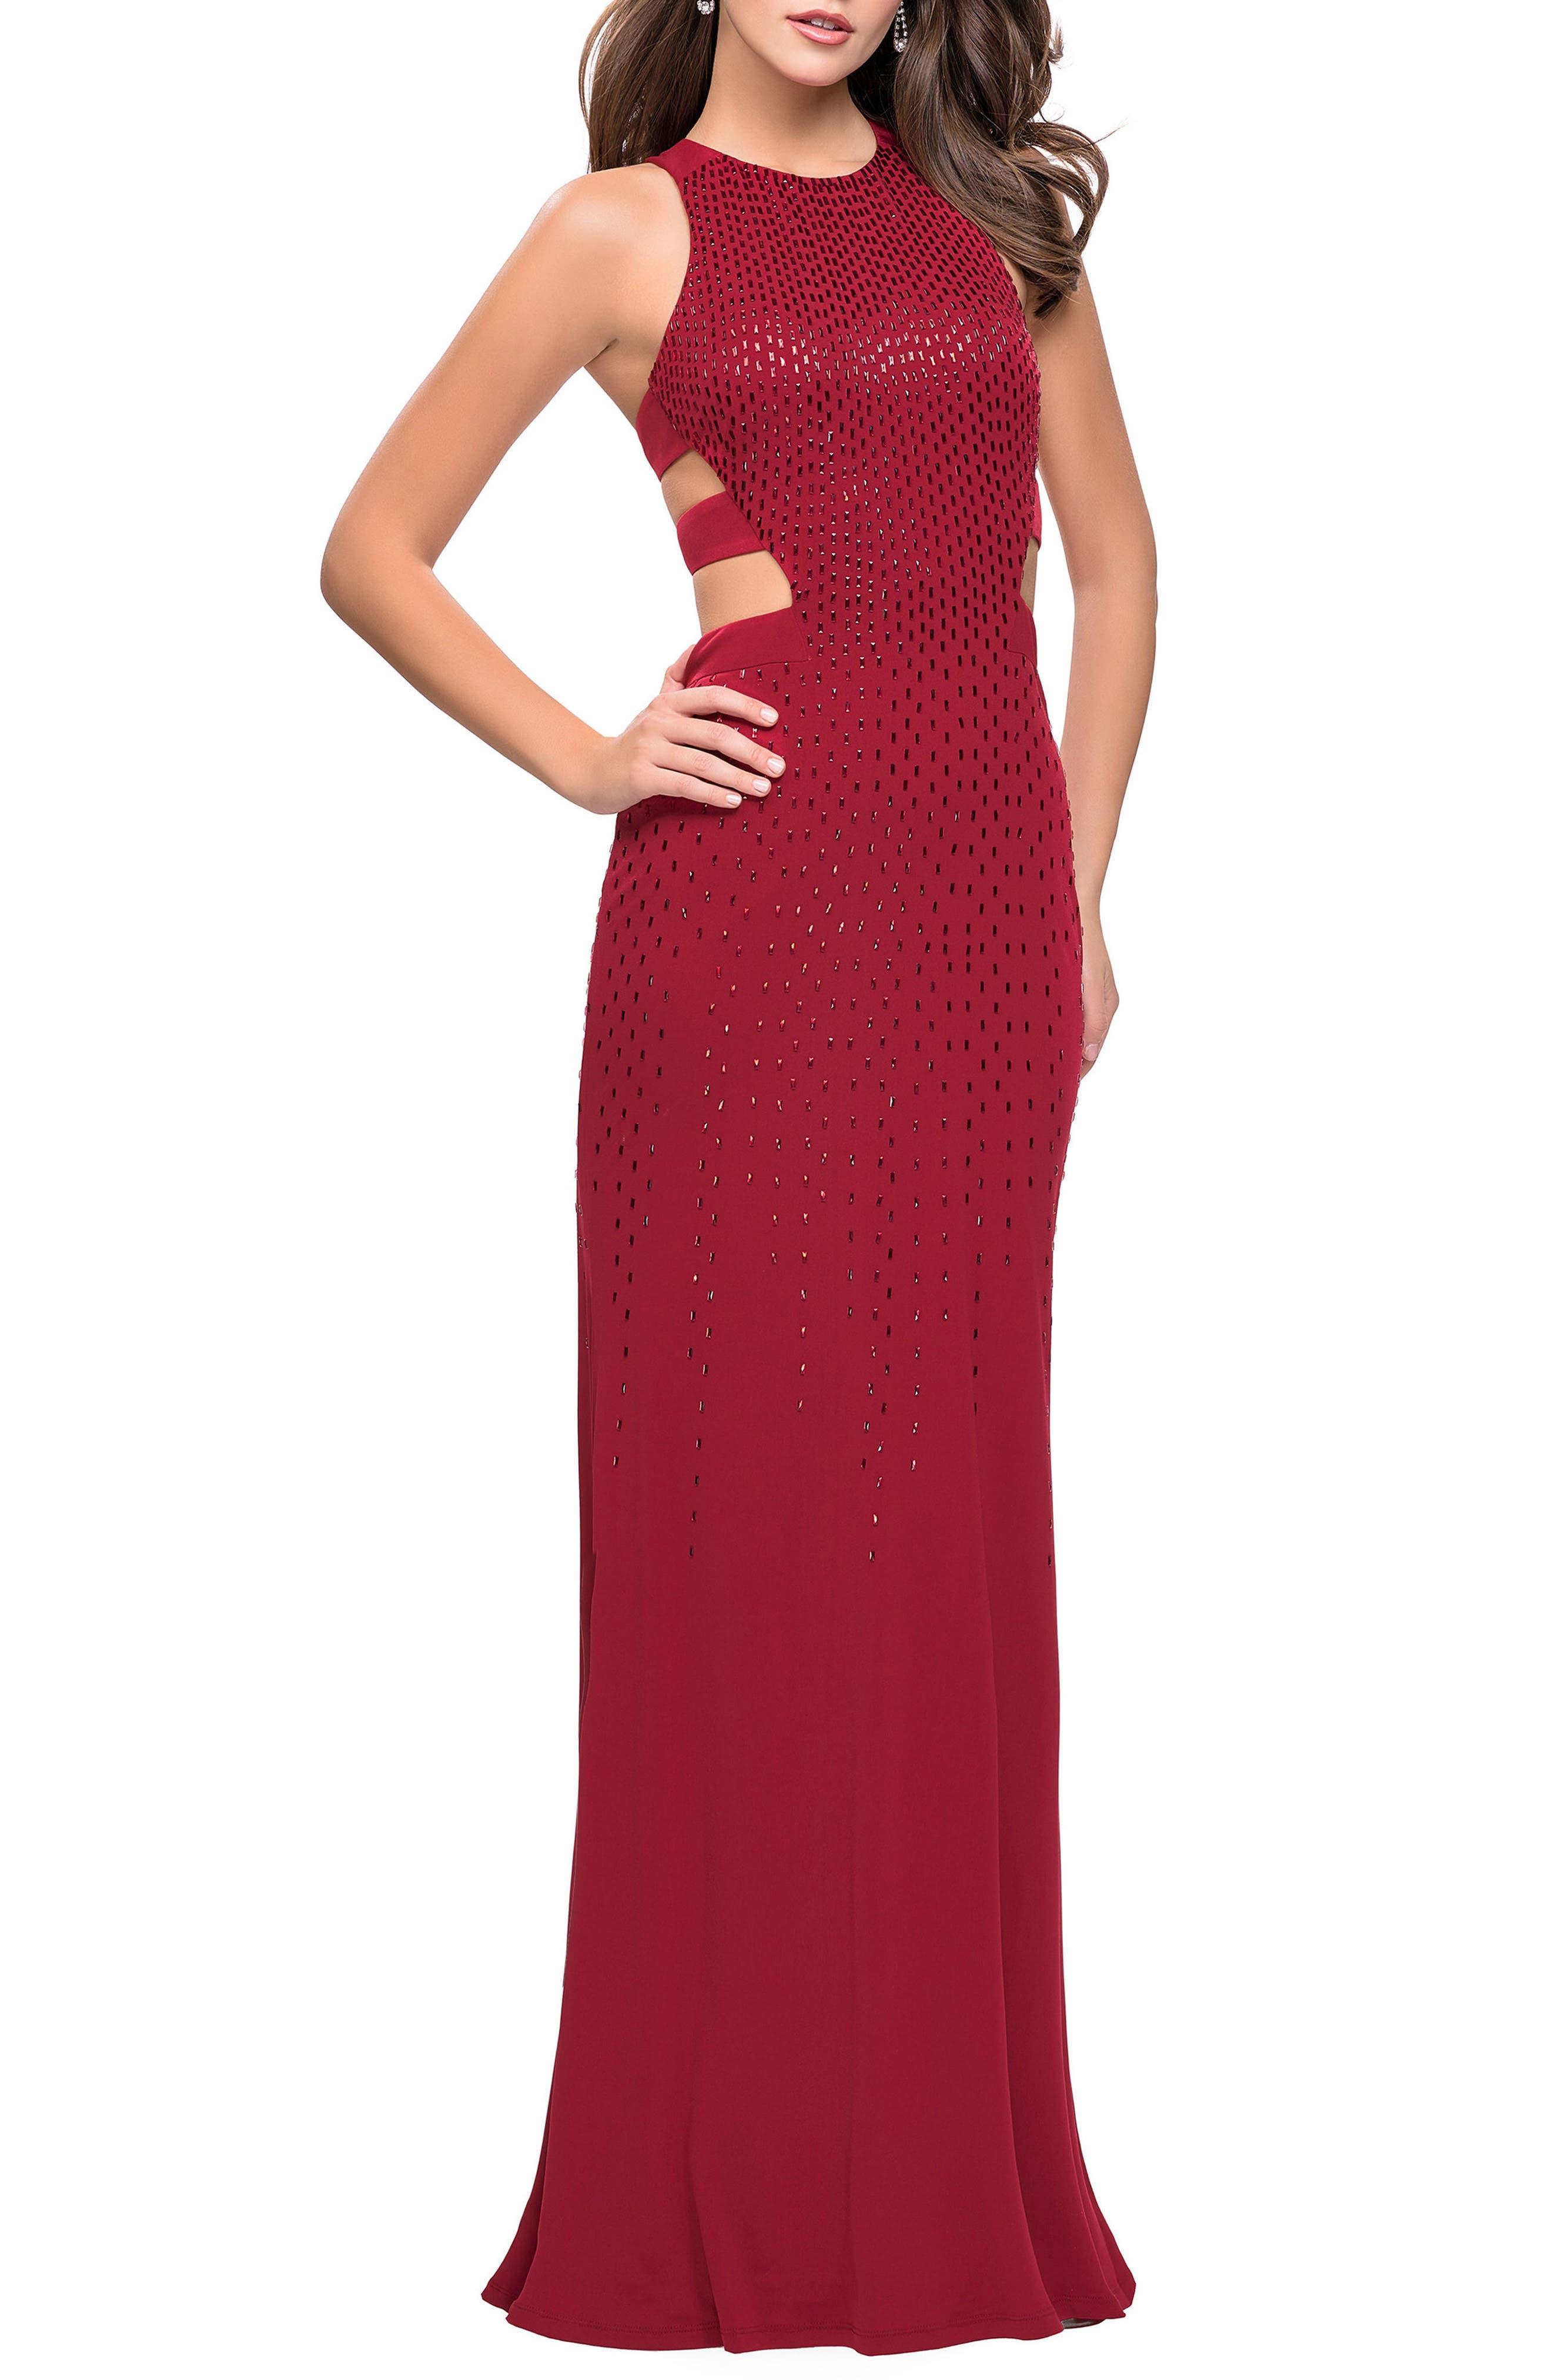 La Femme Cutout Embellished Jersey Gown